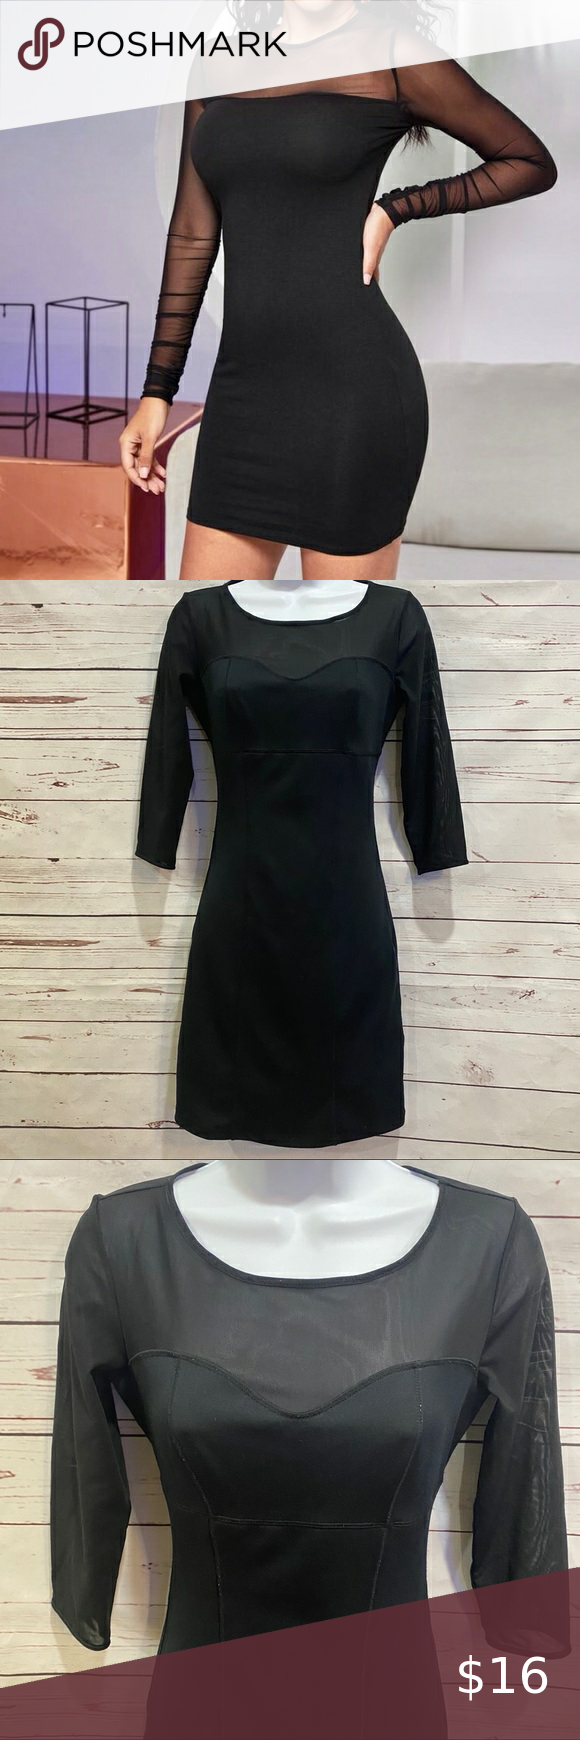 Shape Stational Black Sheer Top Fitted Dress Black Sheer Top Sheer Top Fitted Dress [ 1740 x 580 Pixel ]